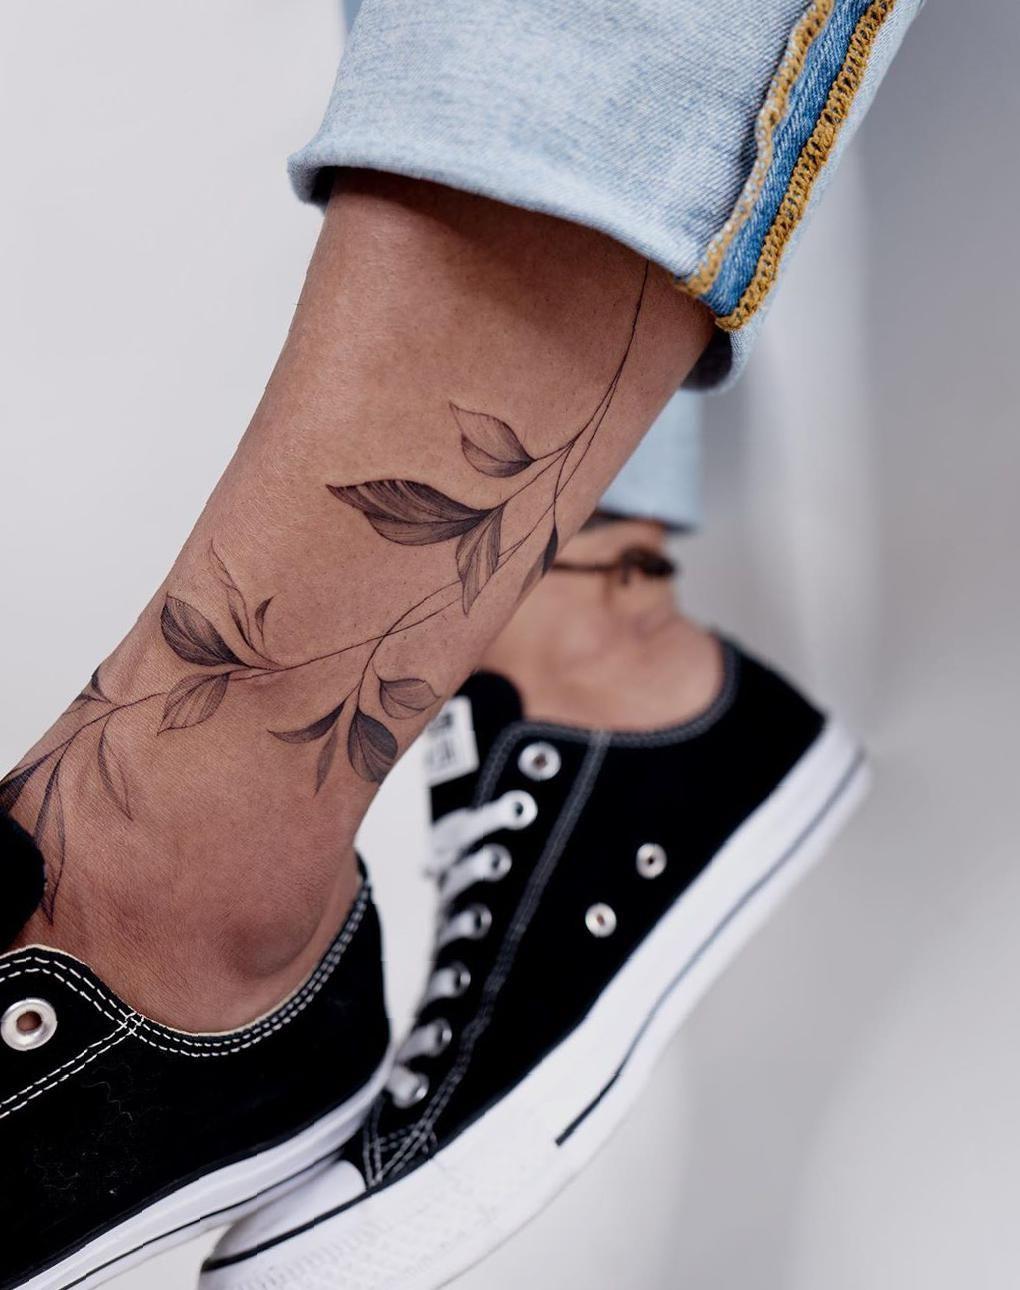 Best Leg Tattoo Idea Images for Women - SooShell